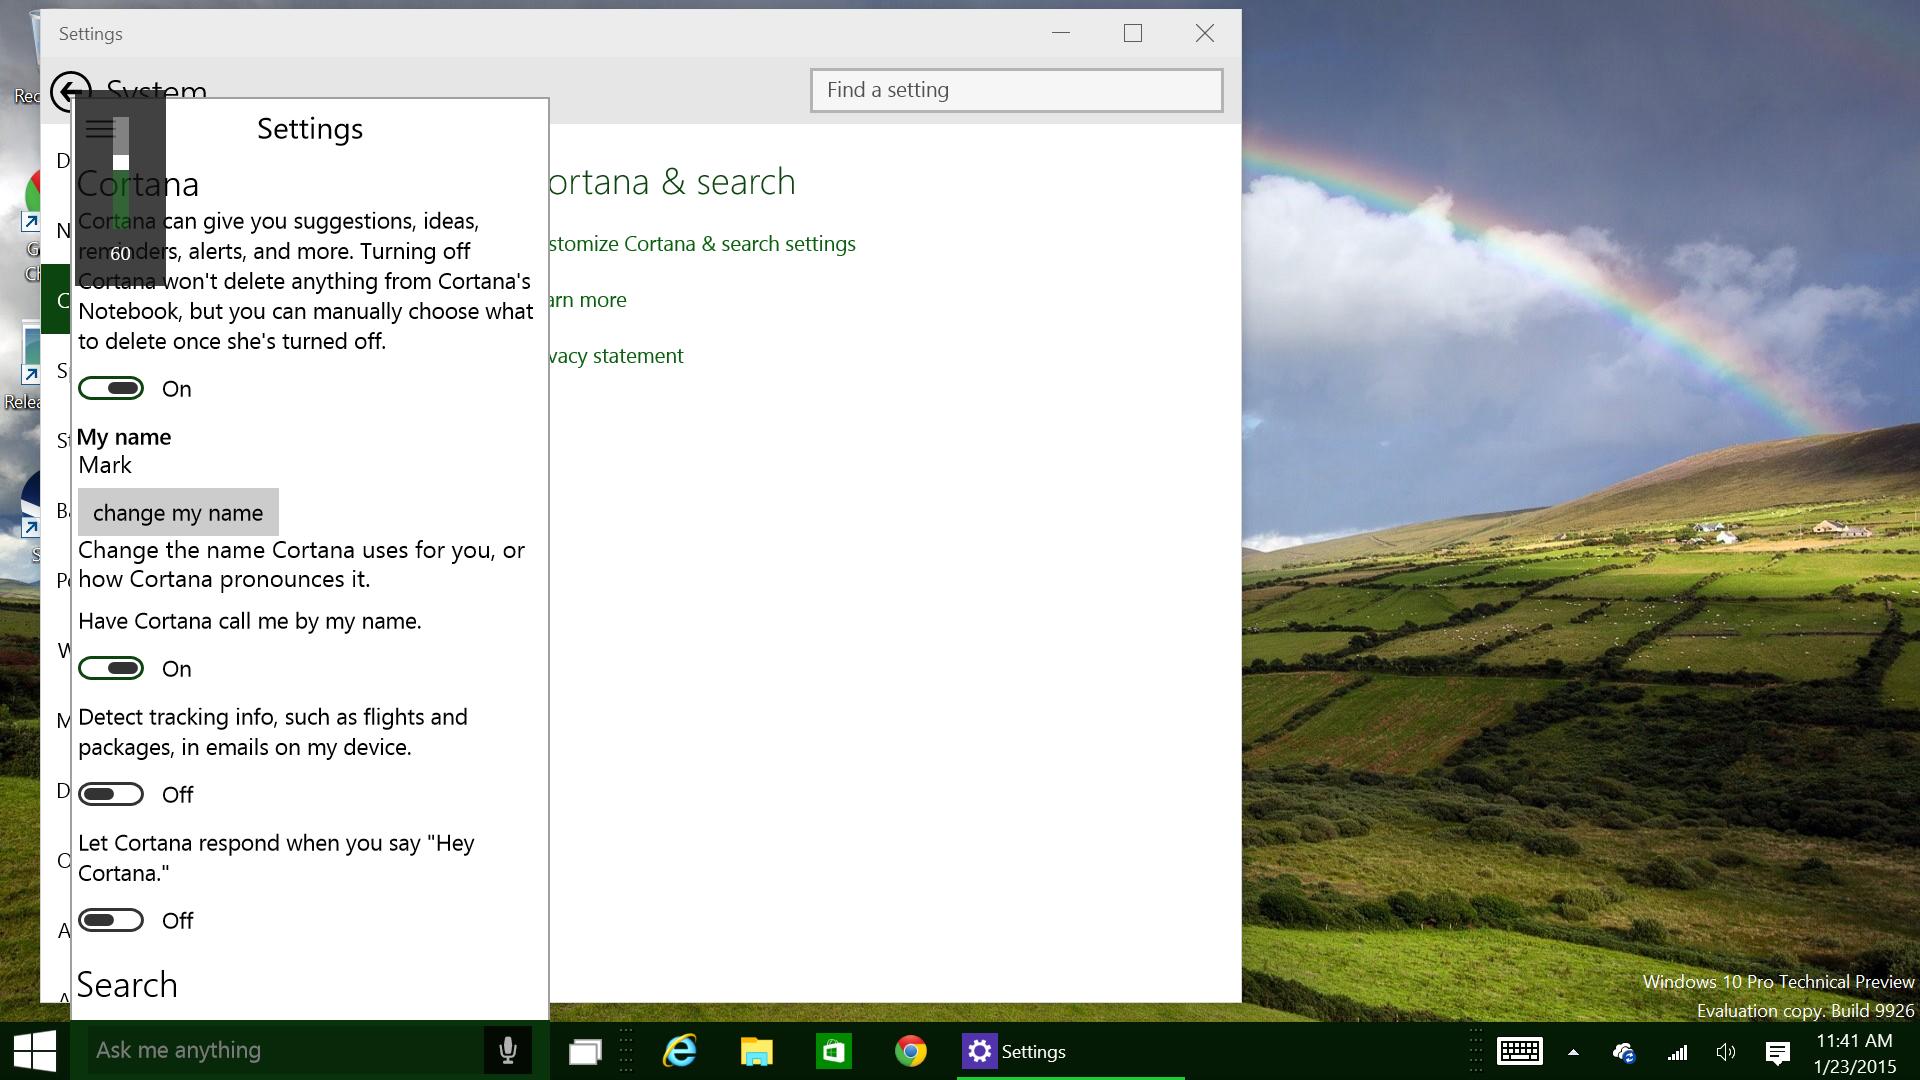 build 9926 - Windows 10